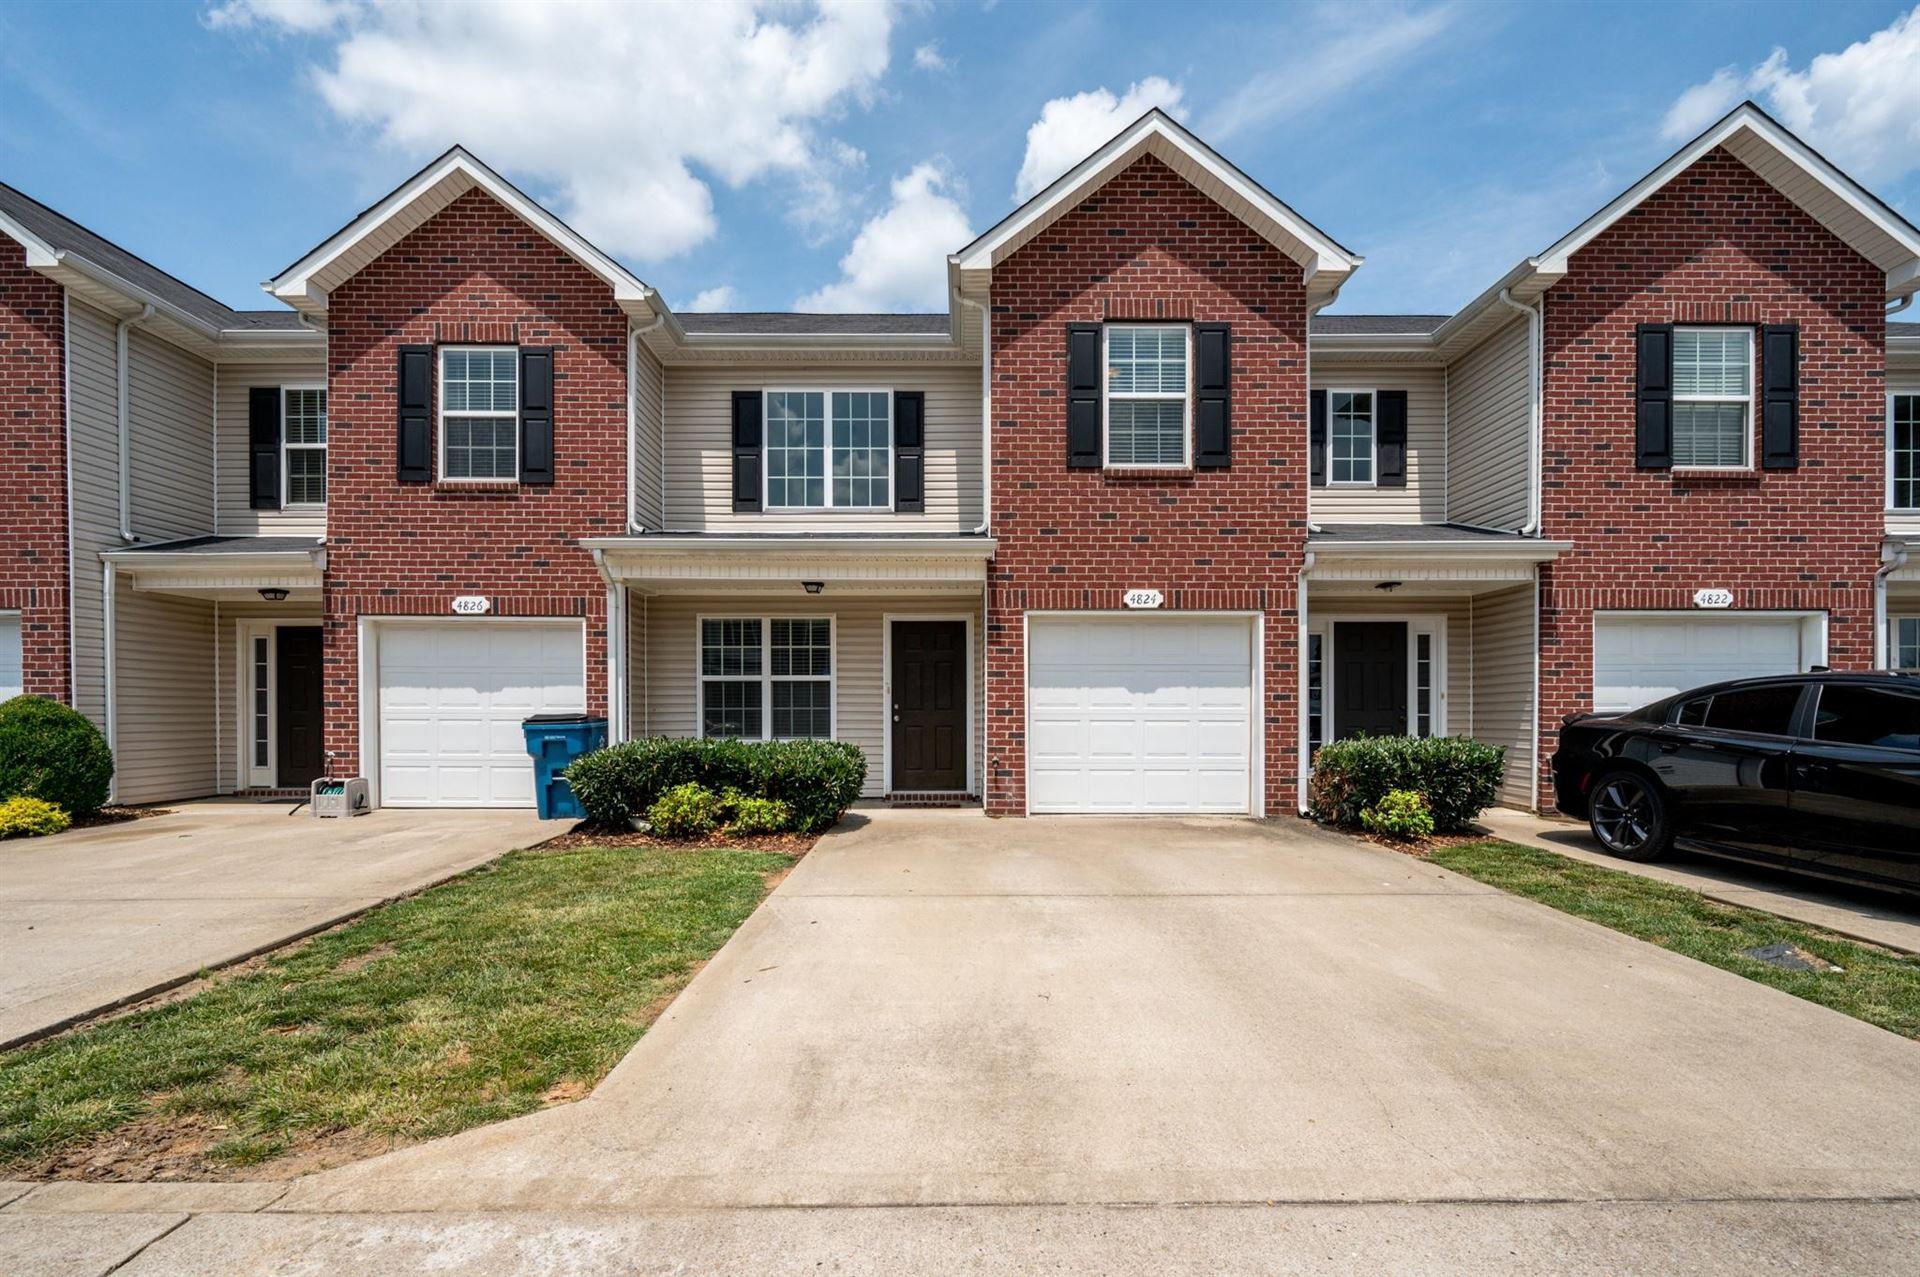 4824 Octavia St, Murfreesboro, TN 37129 - MLS#: 2277250